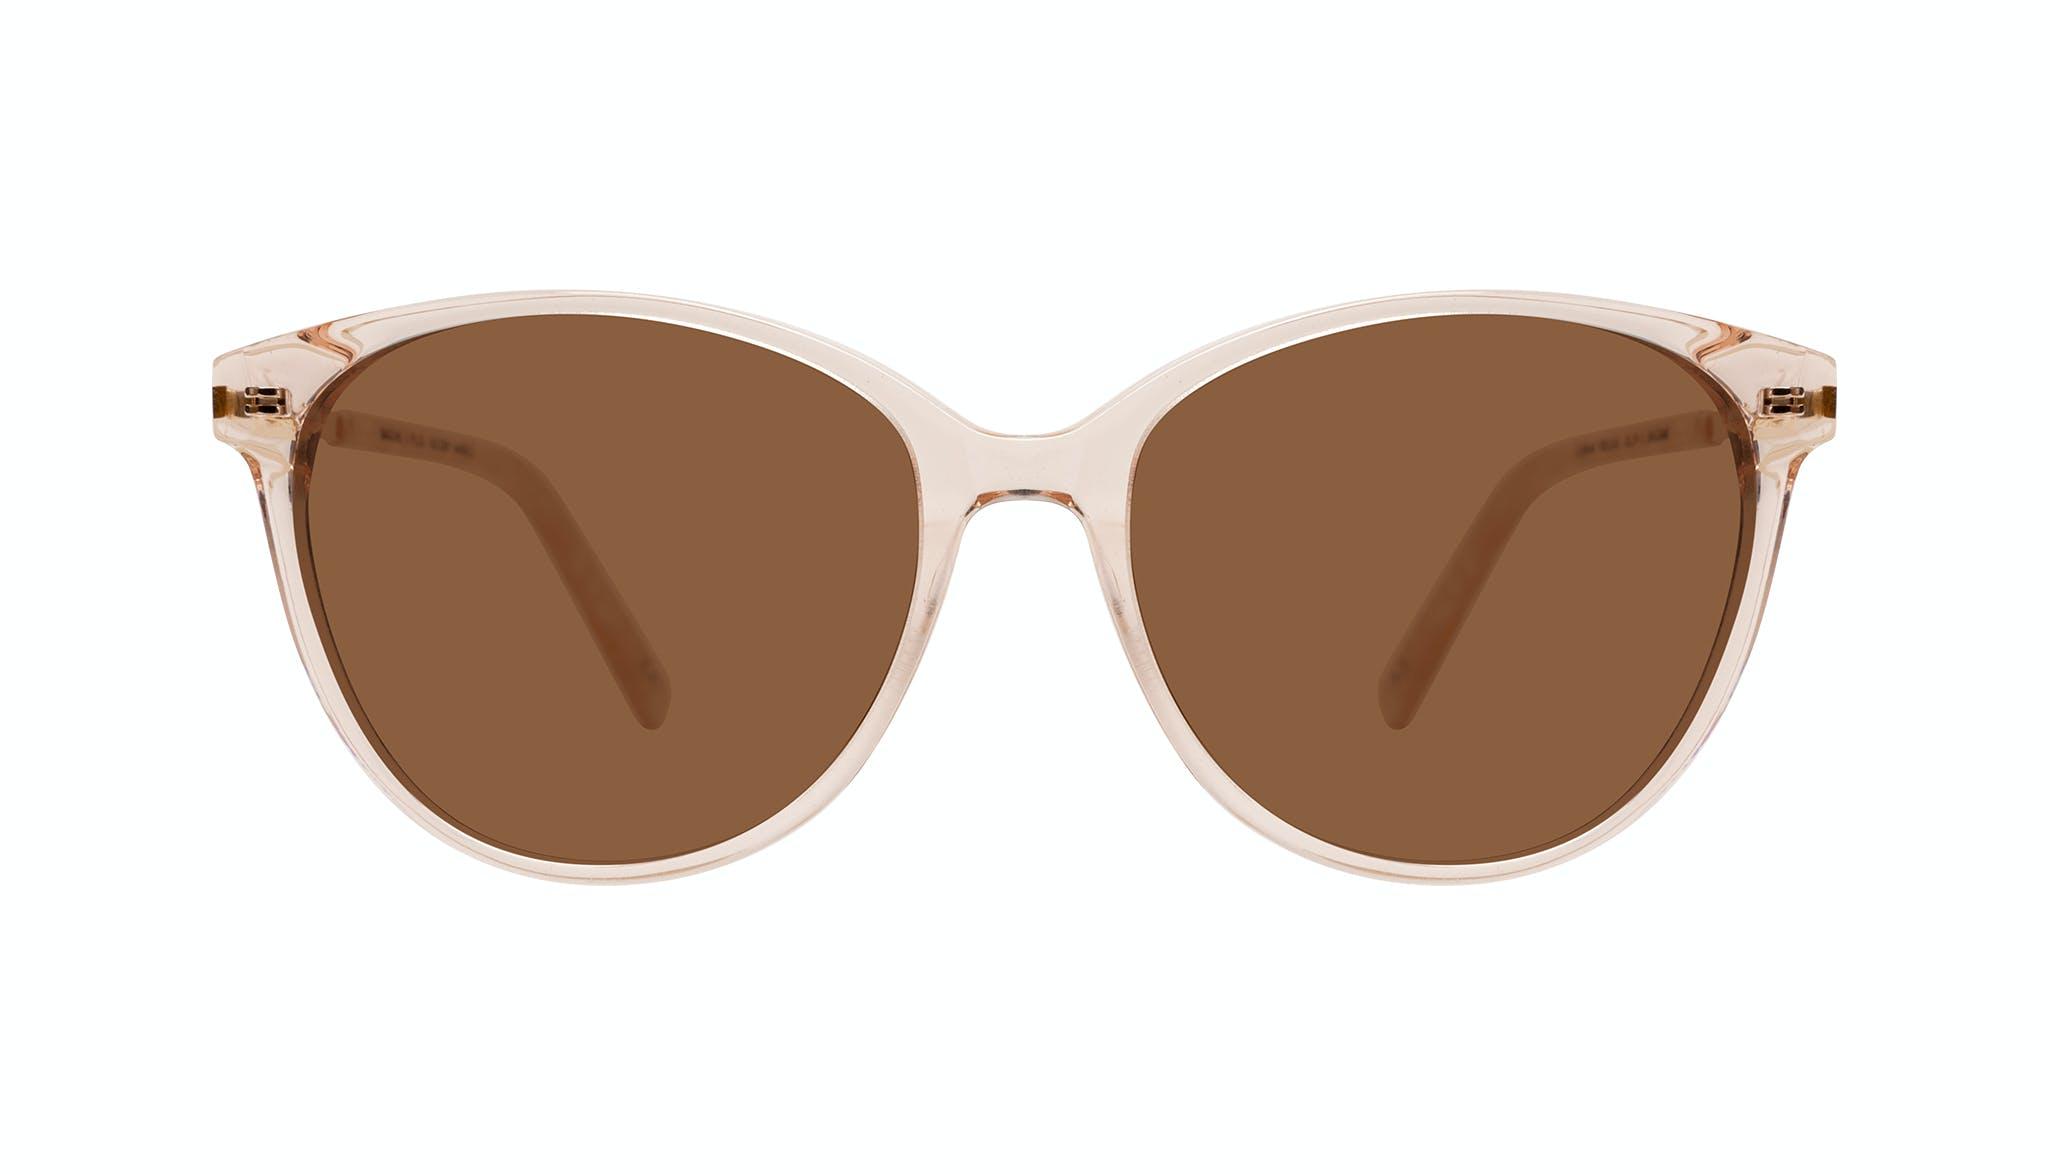 Affordable Fashion Glasses Cat Eye Sunglasses Women Imagine II Plus Golden Marble